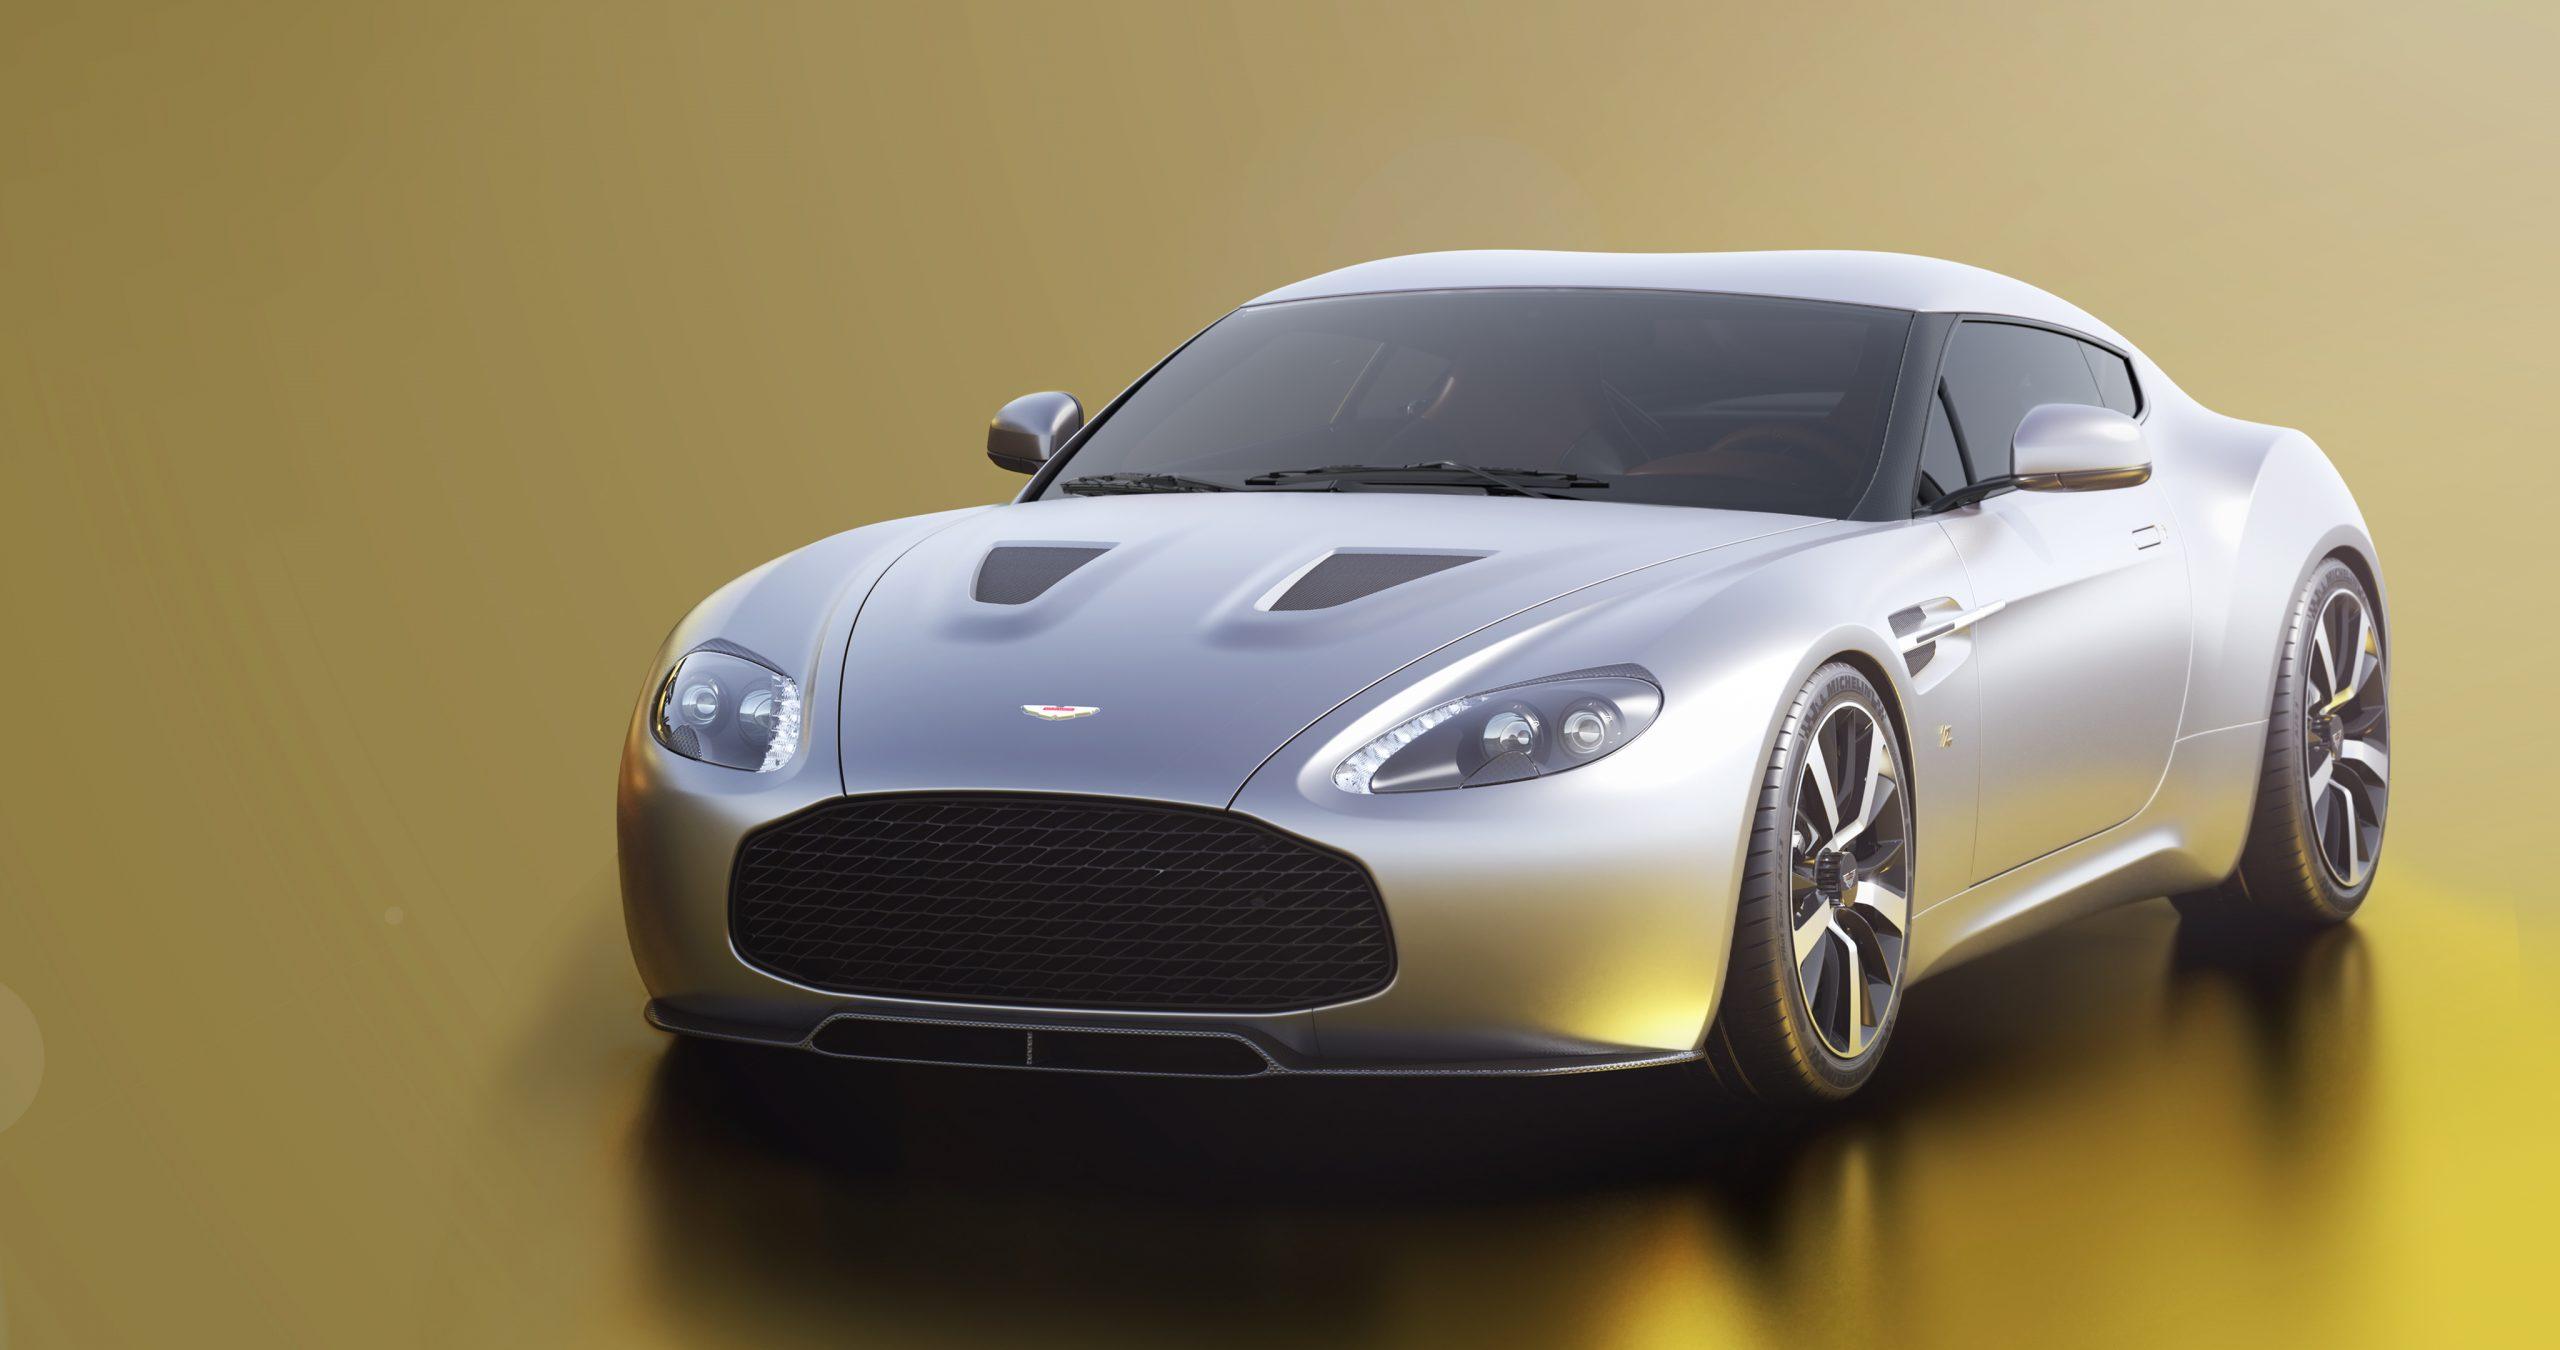 Aston Martin Vantage V12 Zagato Heritage TWINS by R-Reforged 5 - Coupé